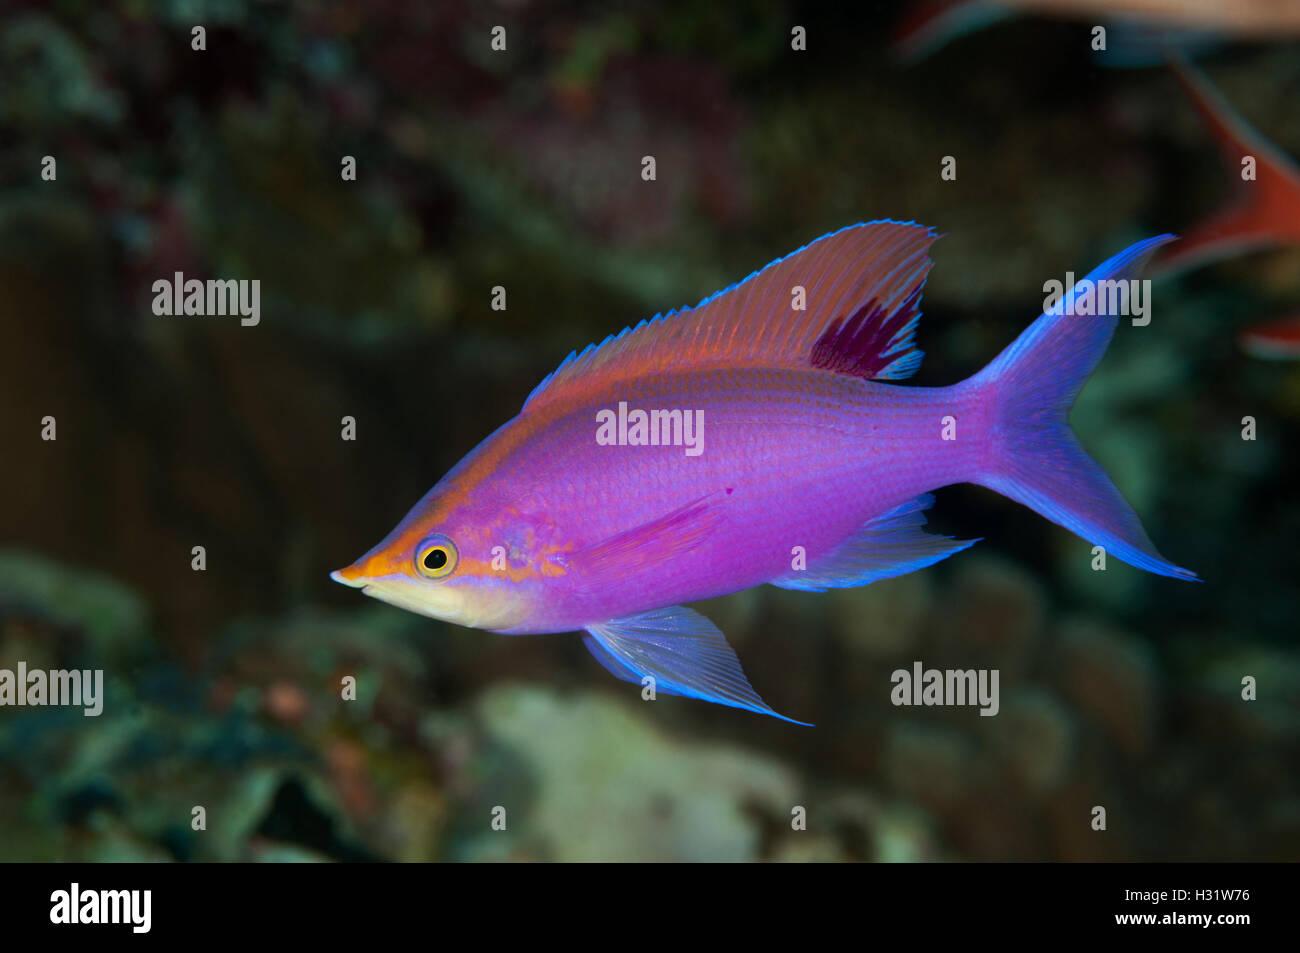 QZ73807-D. Purple Anthias (Pseudanthias tuka), male. Australia, Great Barrier Reef, Pacific Ocean. Photo Copyright Stock Photo